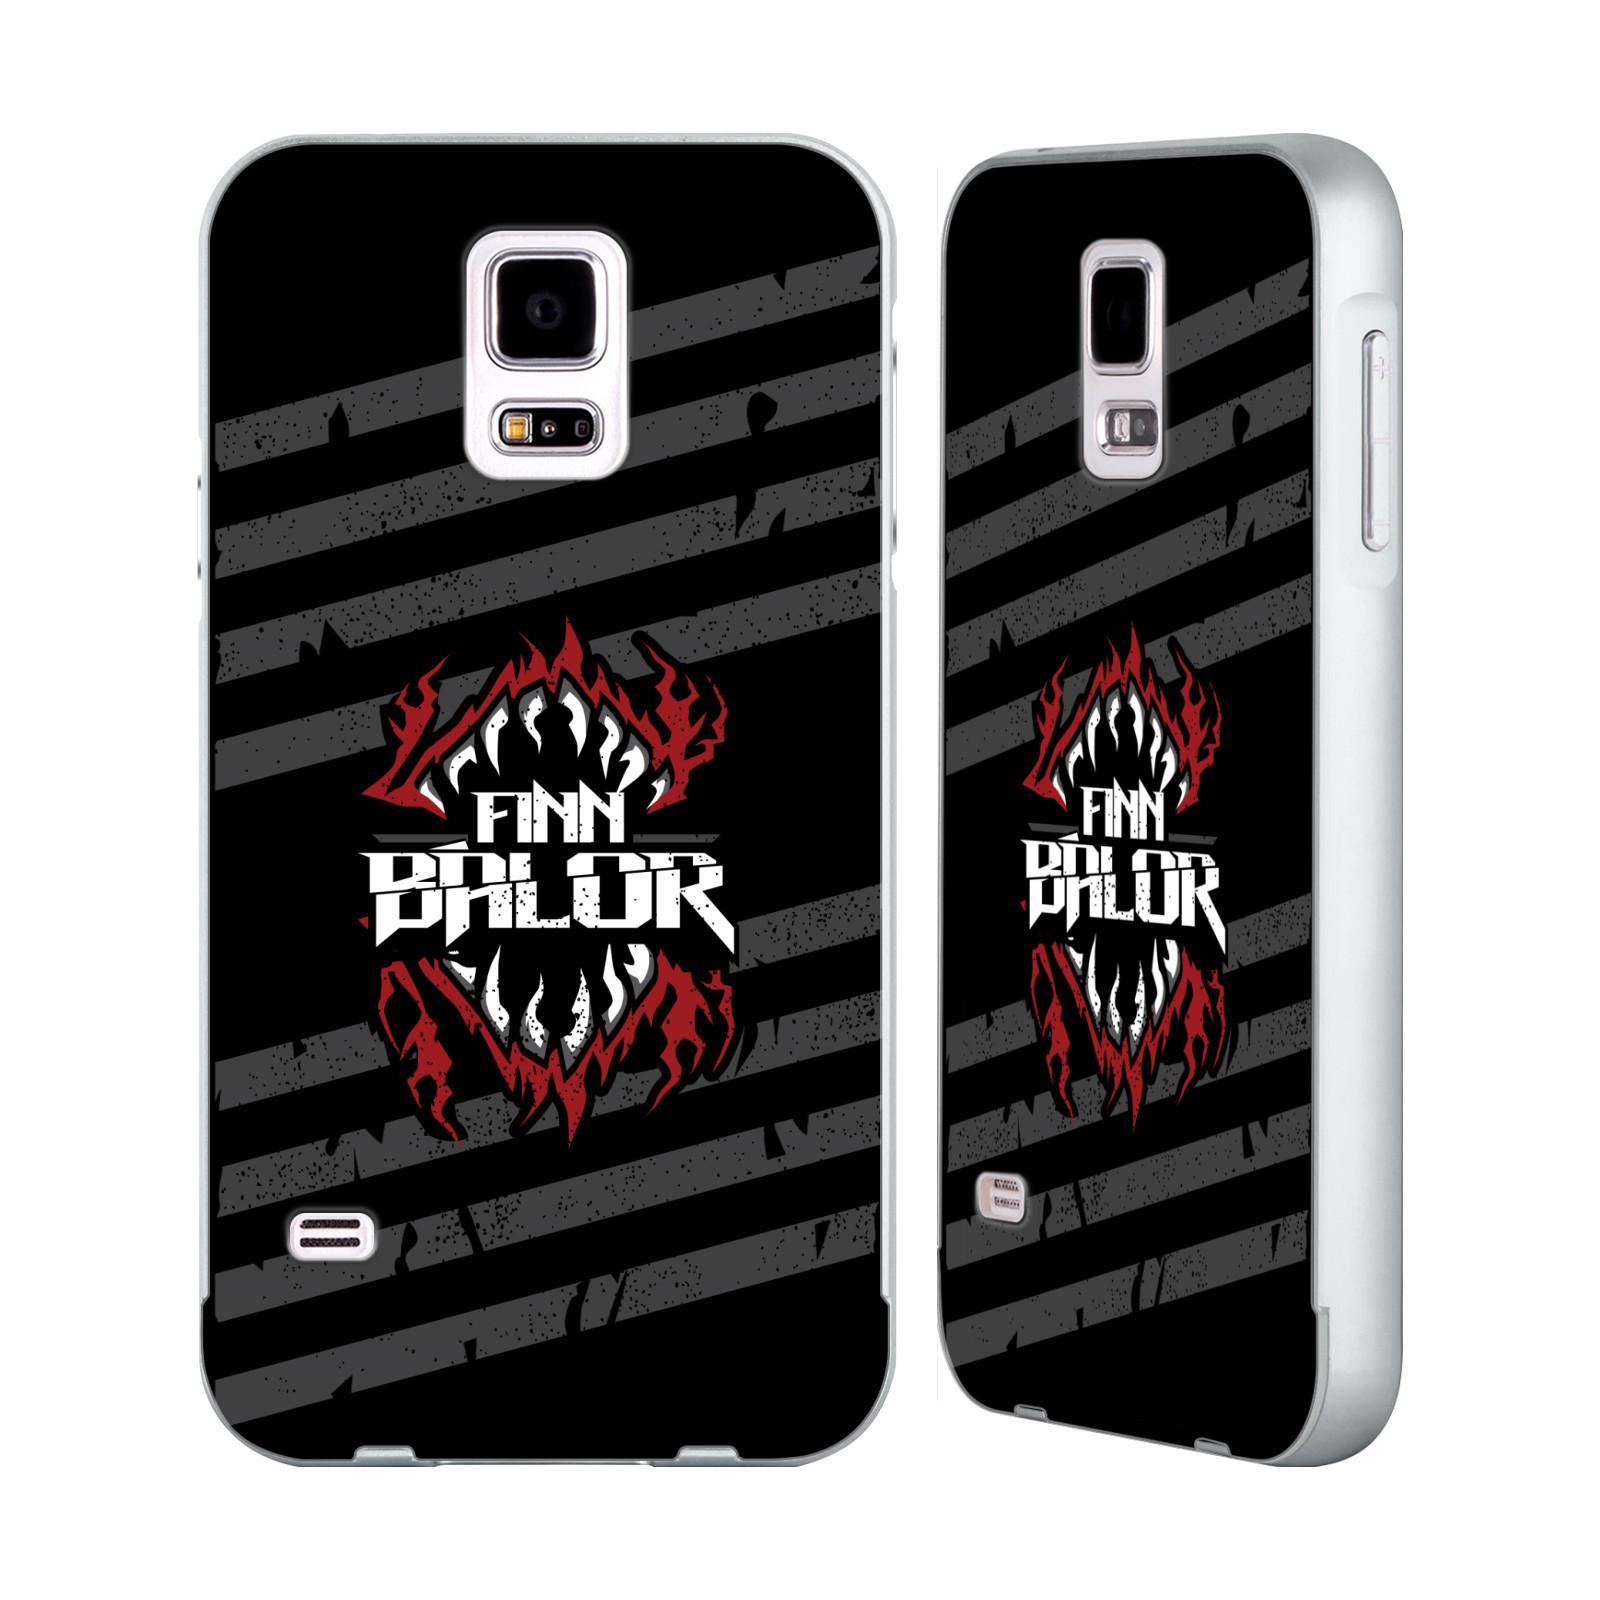 OFFICIAL-WWE-2017-FINN-BALOR-SILVER-BUMPER-SLIDER-CASE-FOR-SAMSUNG-PHONES